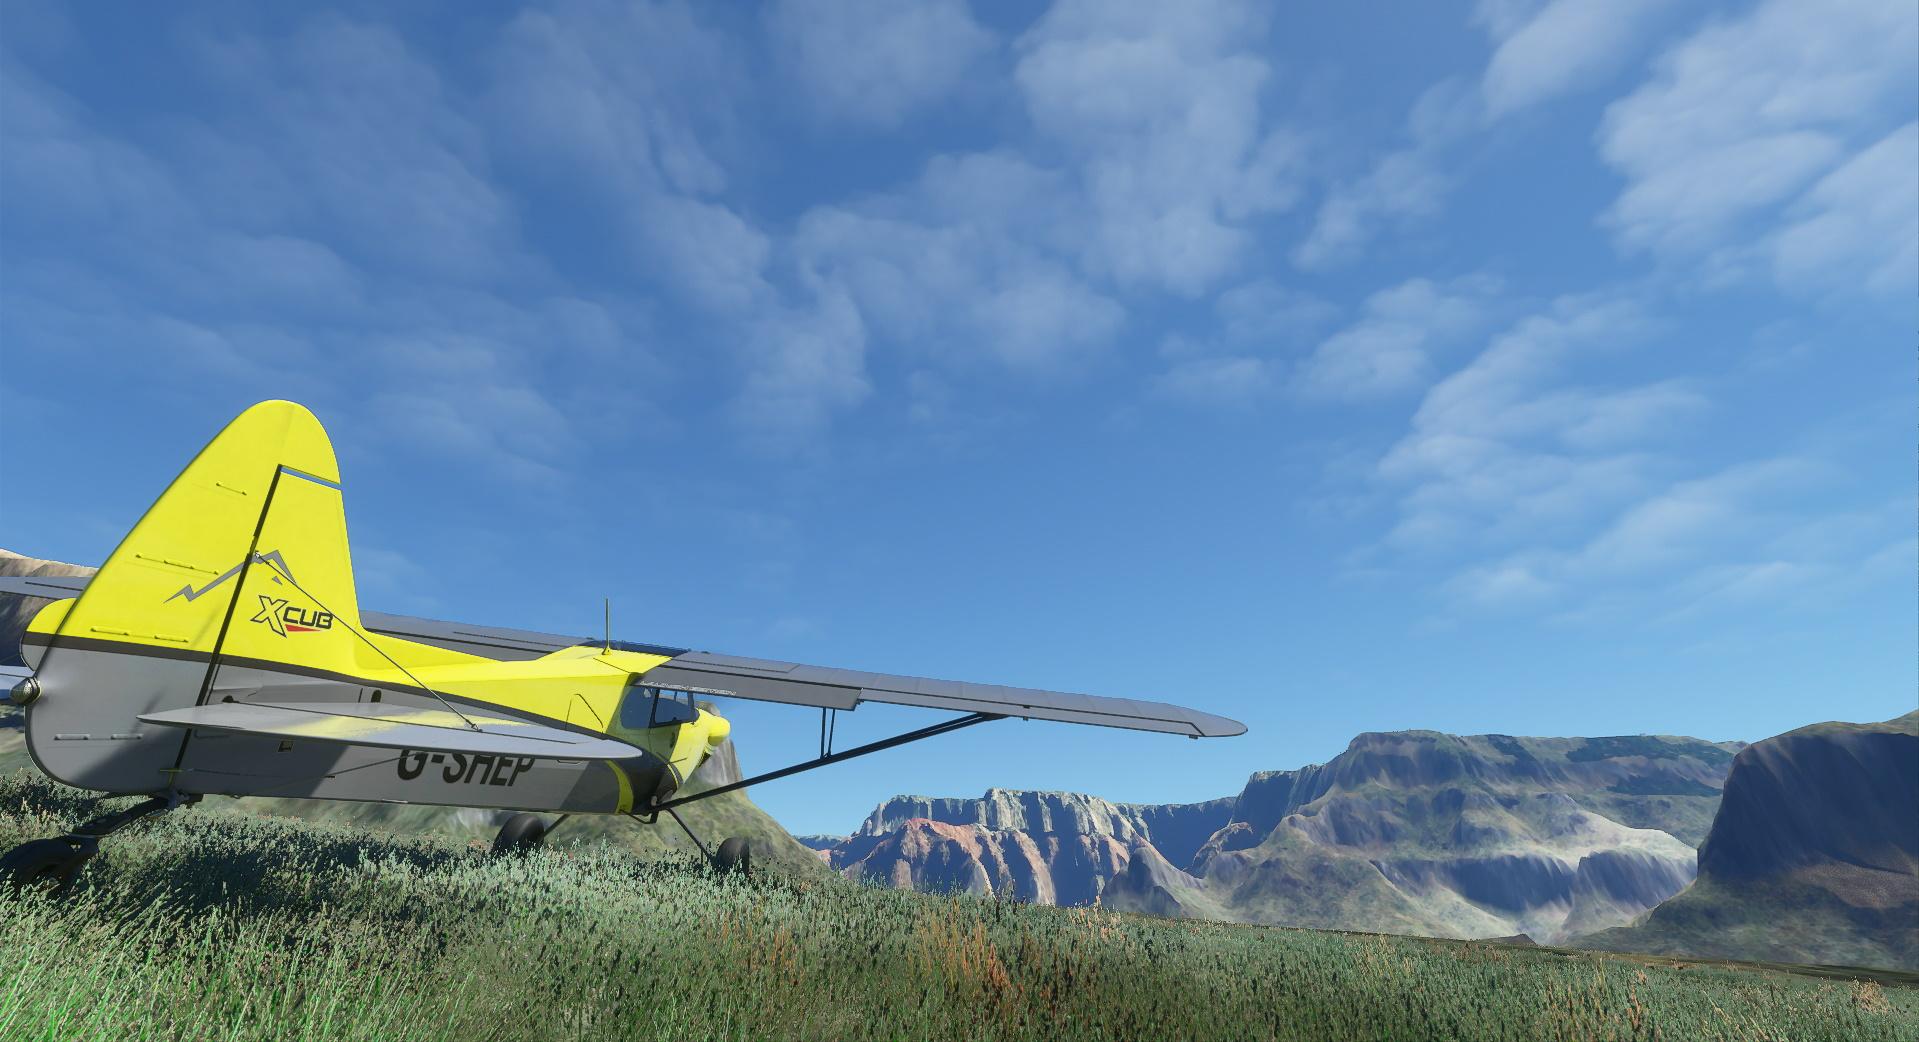 Microsoft Flight Simulator Cub In The Canyon